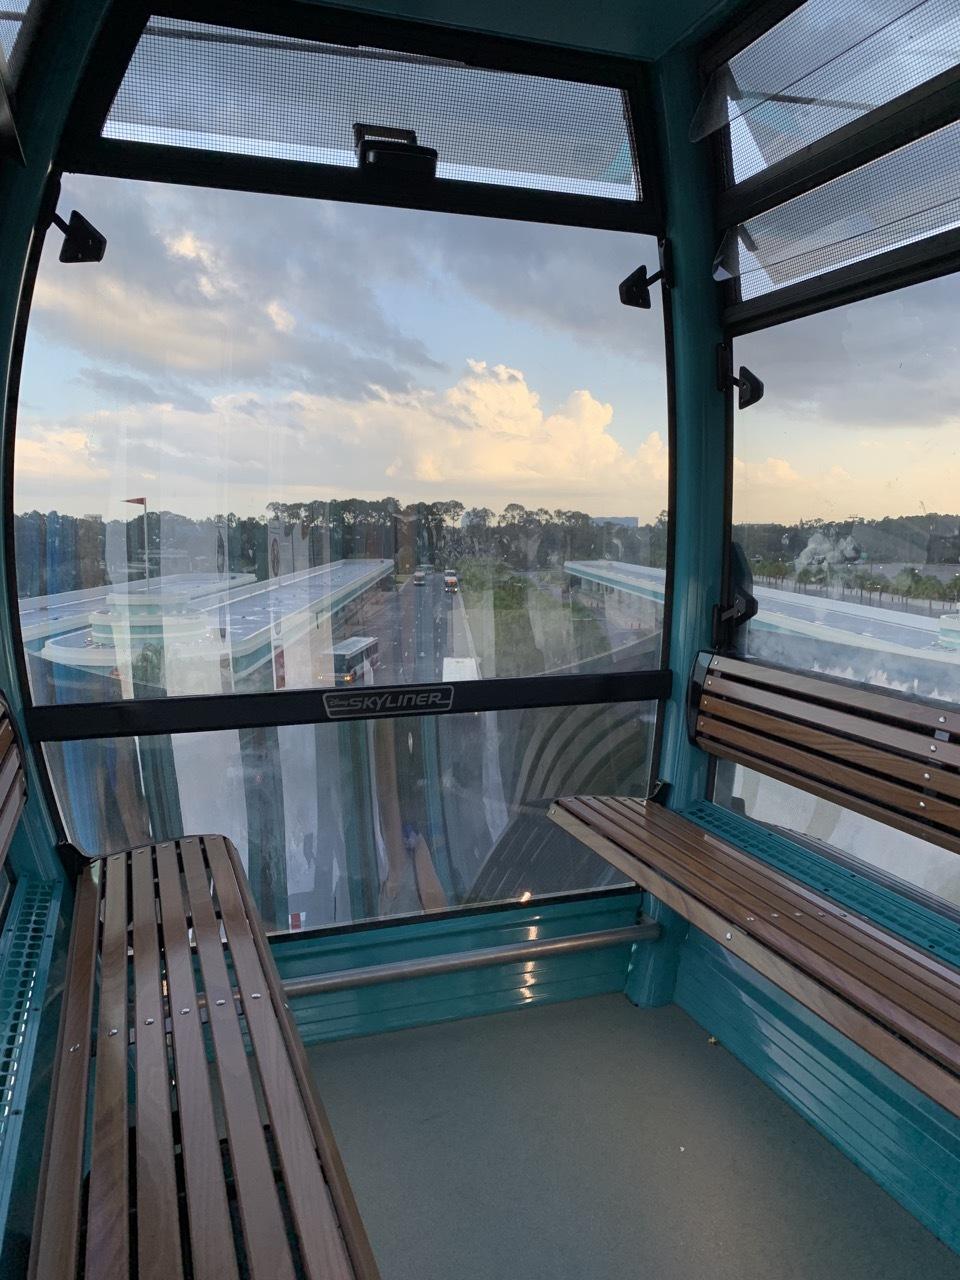 disney world skyliner gondola inside.jpg